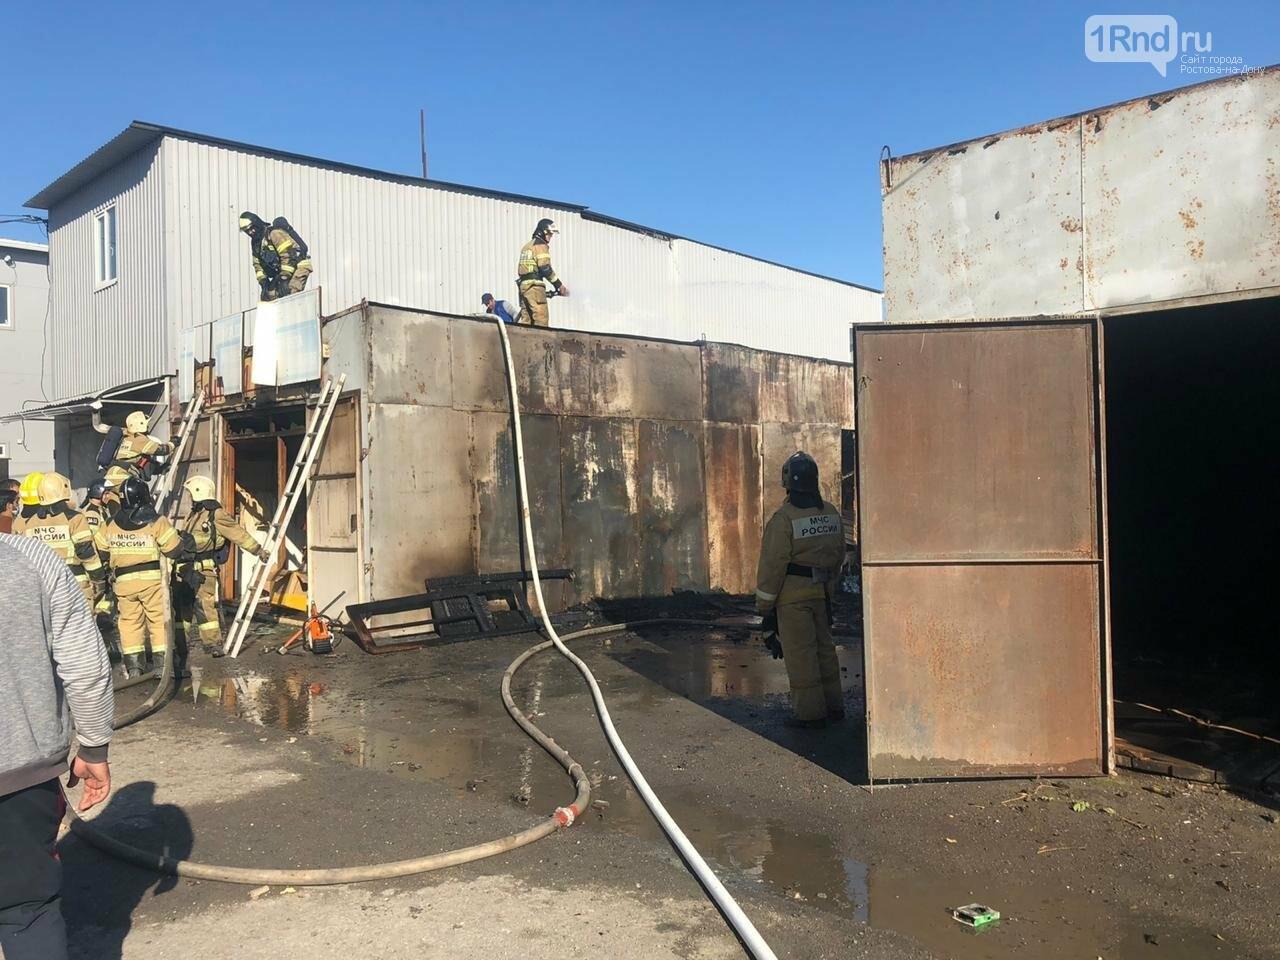 Пожар на складе пиротехники в районе Алмаза, Фото - ГУ МЧС по РО